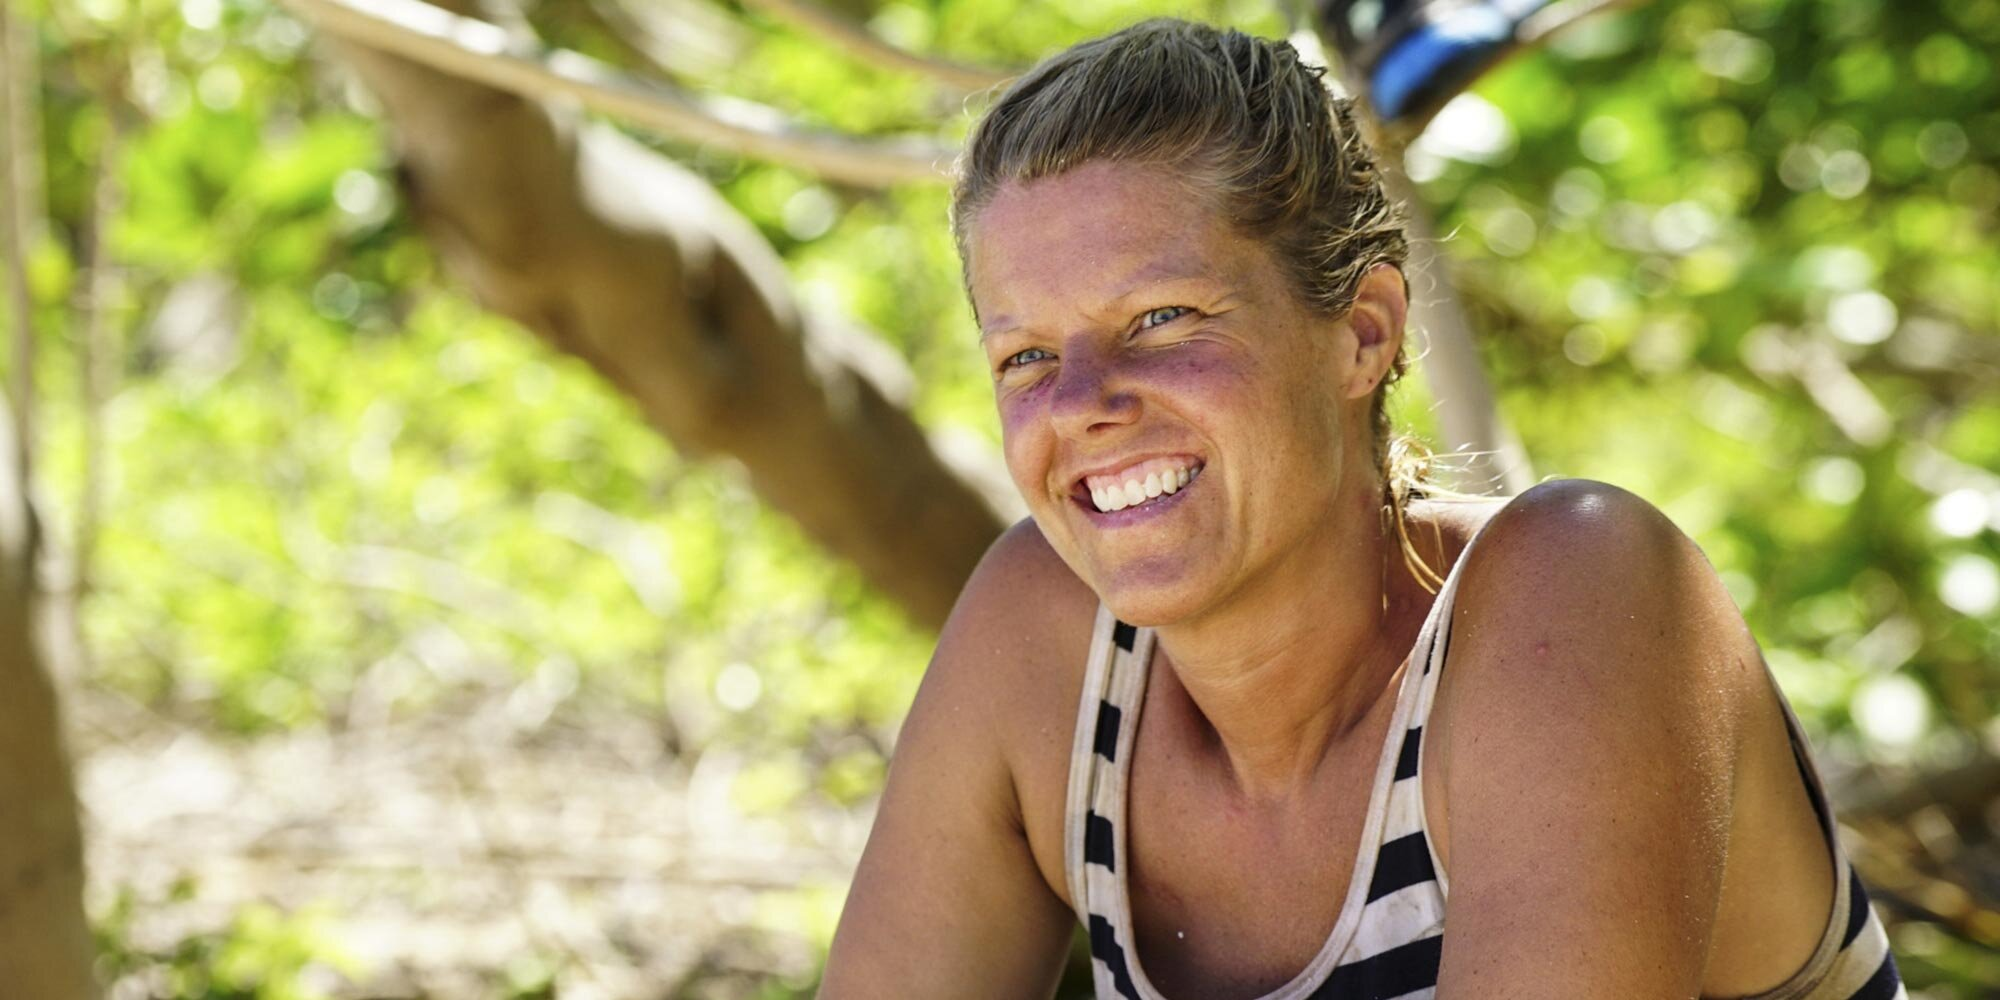 Survivor: Millennials vs. Gen X star Sunday Burquest dies of cancer | EW.com – Entertainment Weekly News